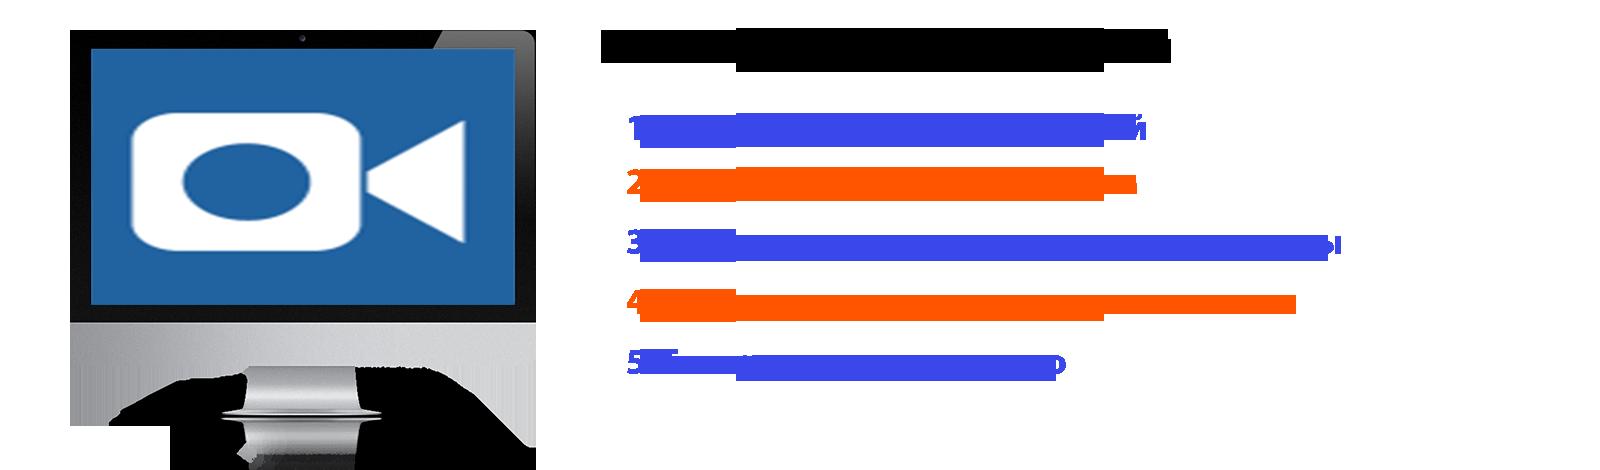 Blok_5_video